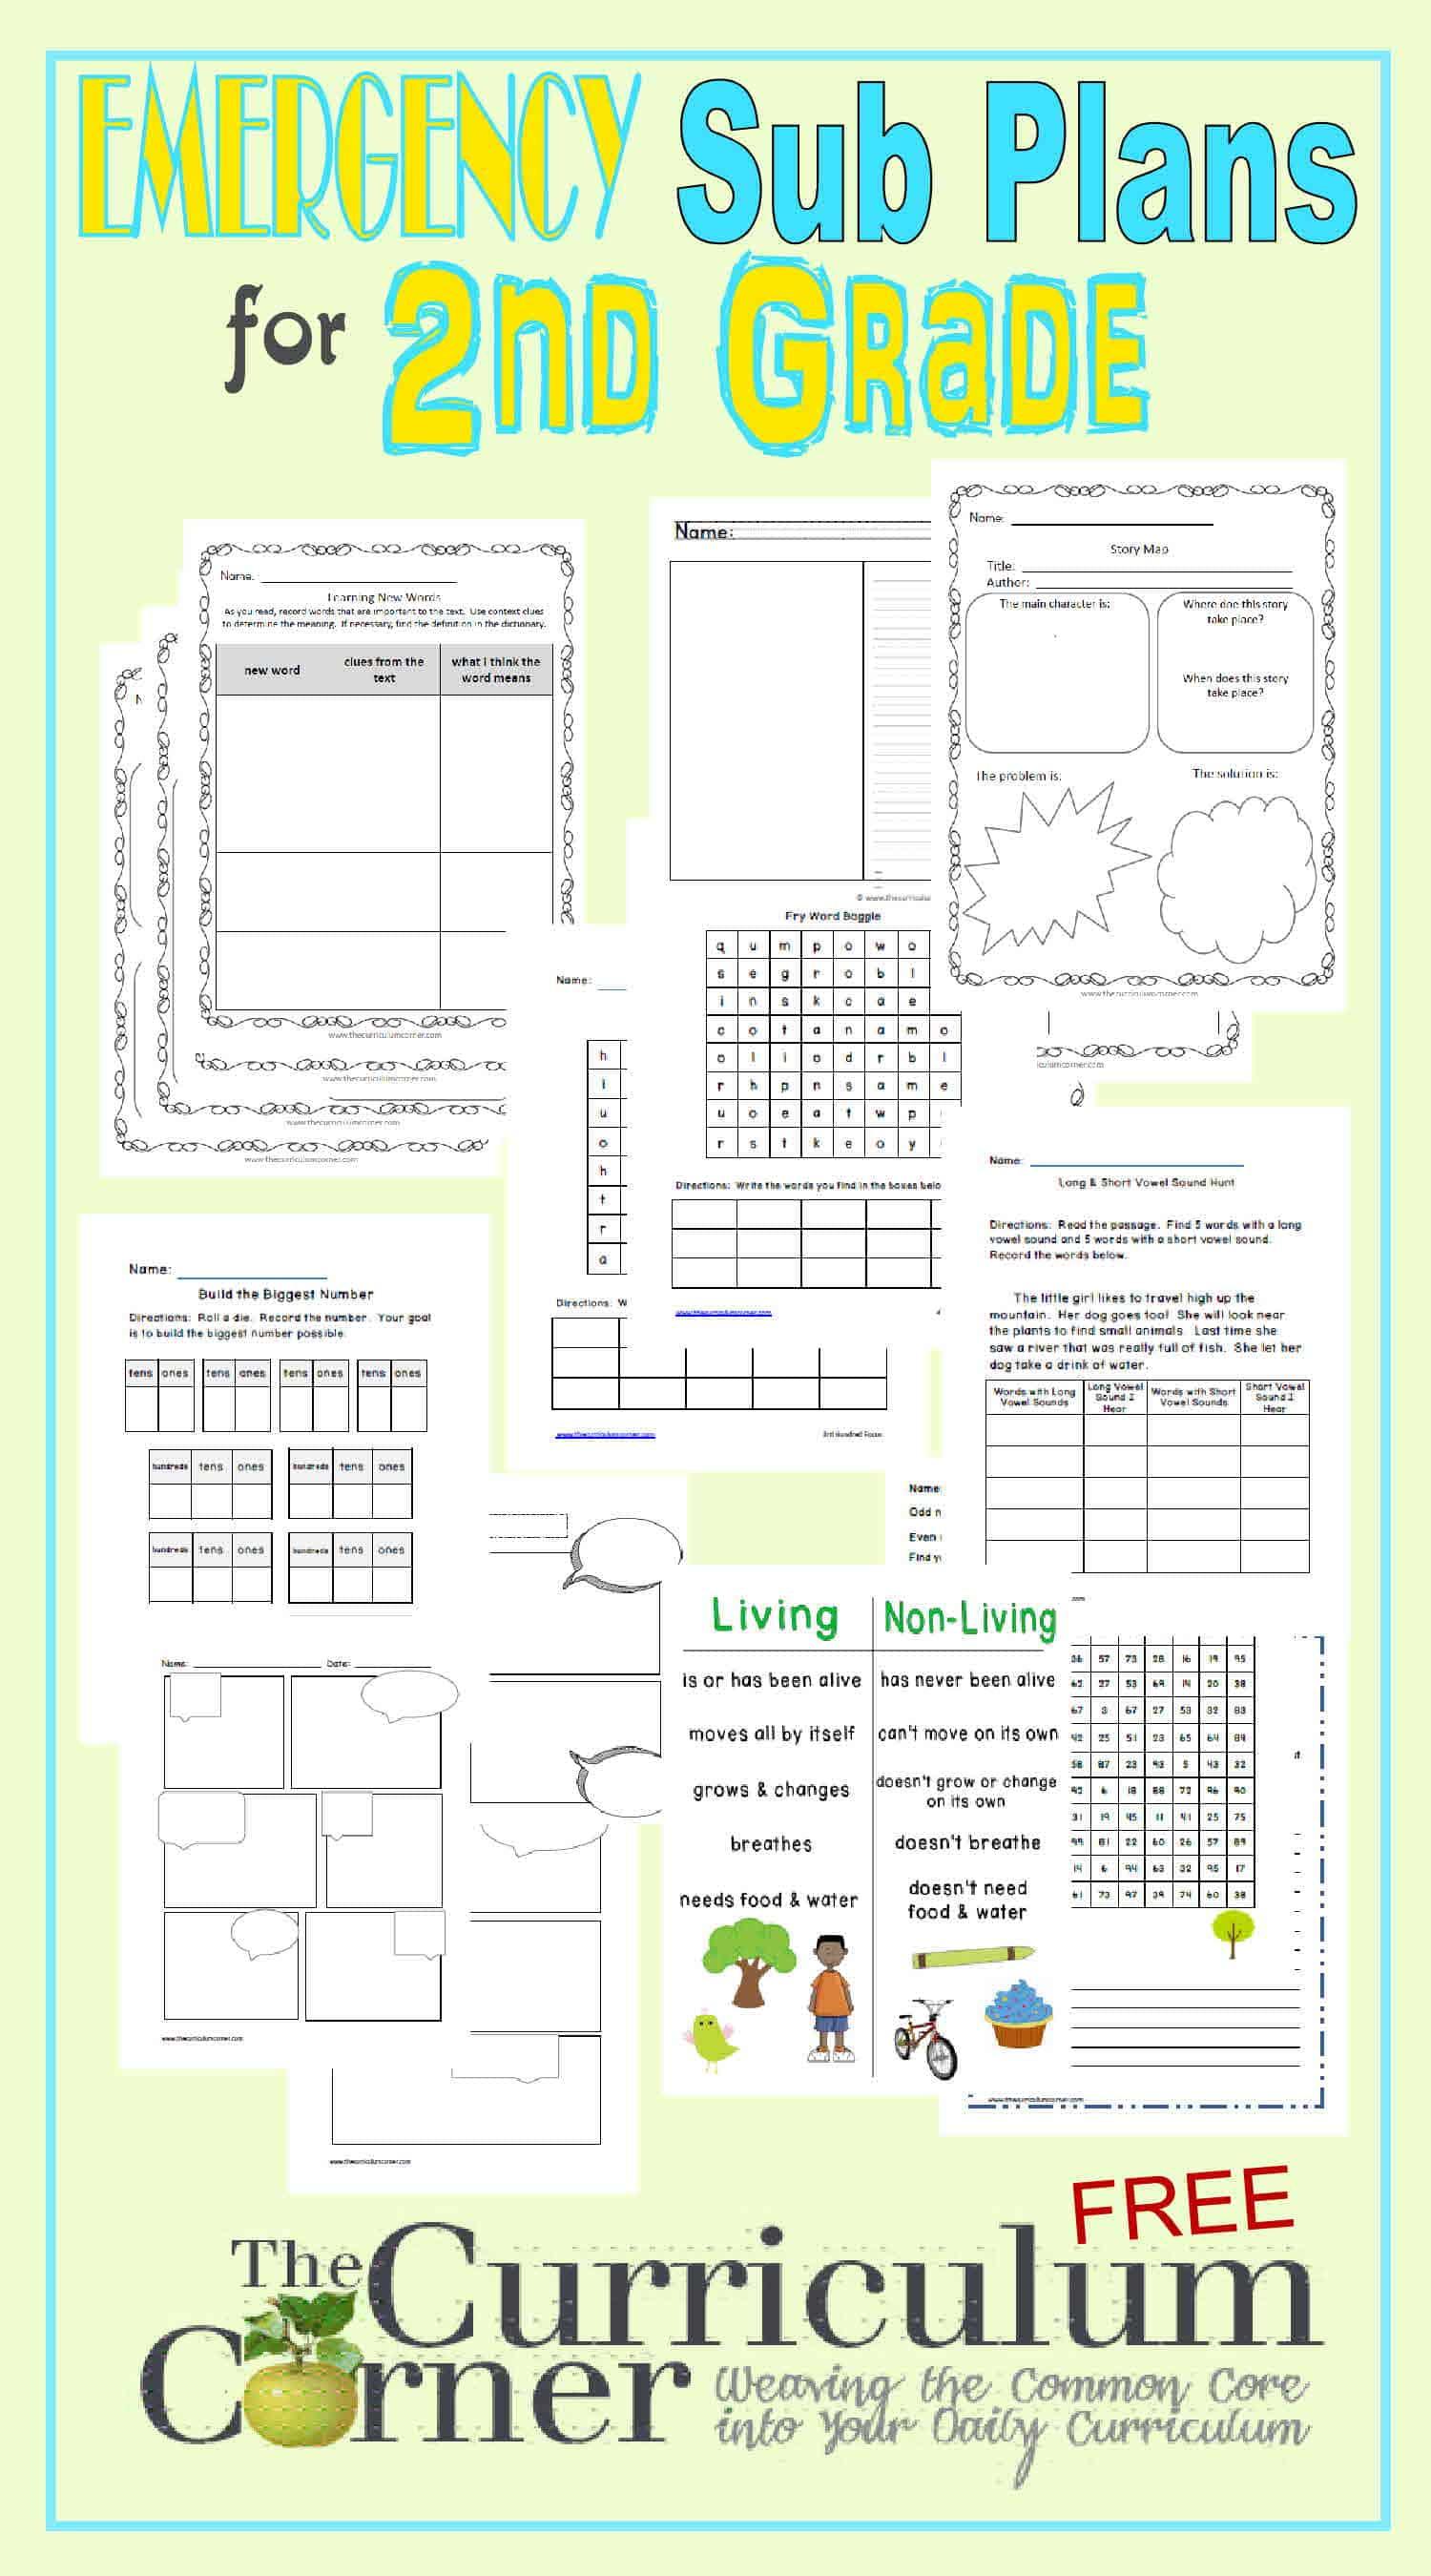 2nd Grade Emergency Sub Plans